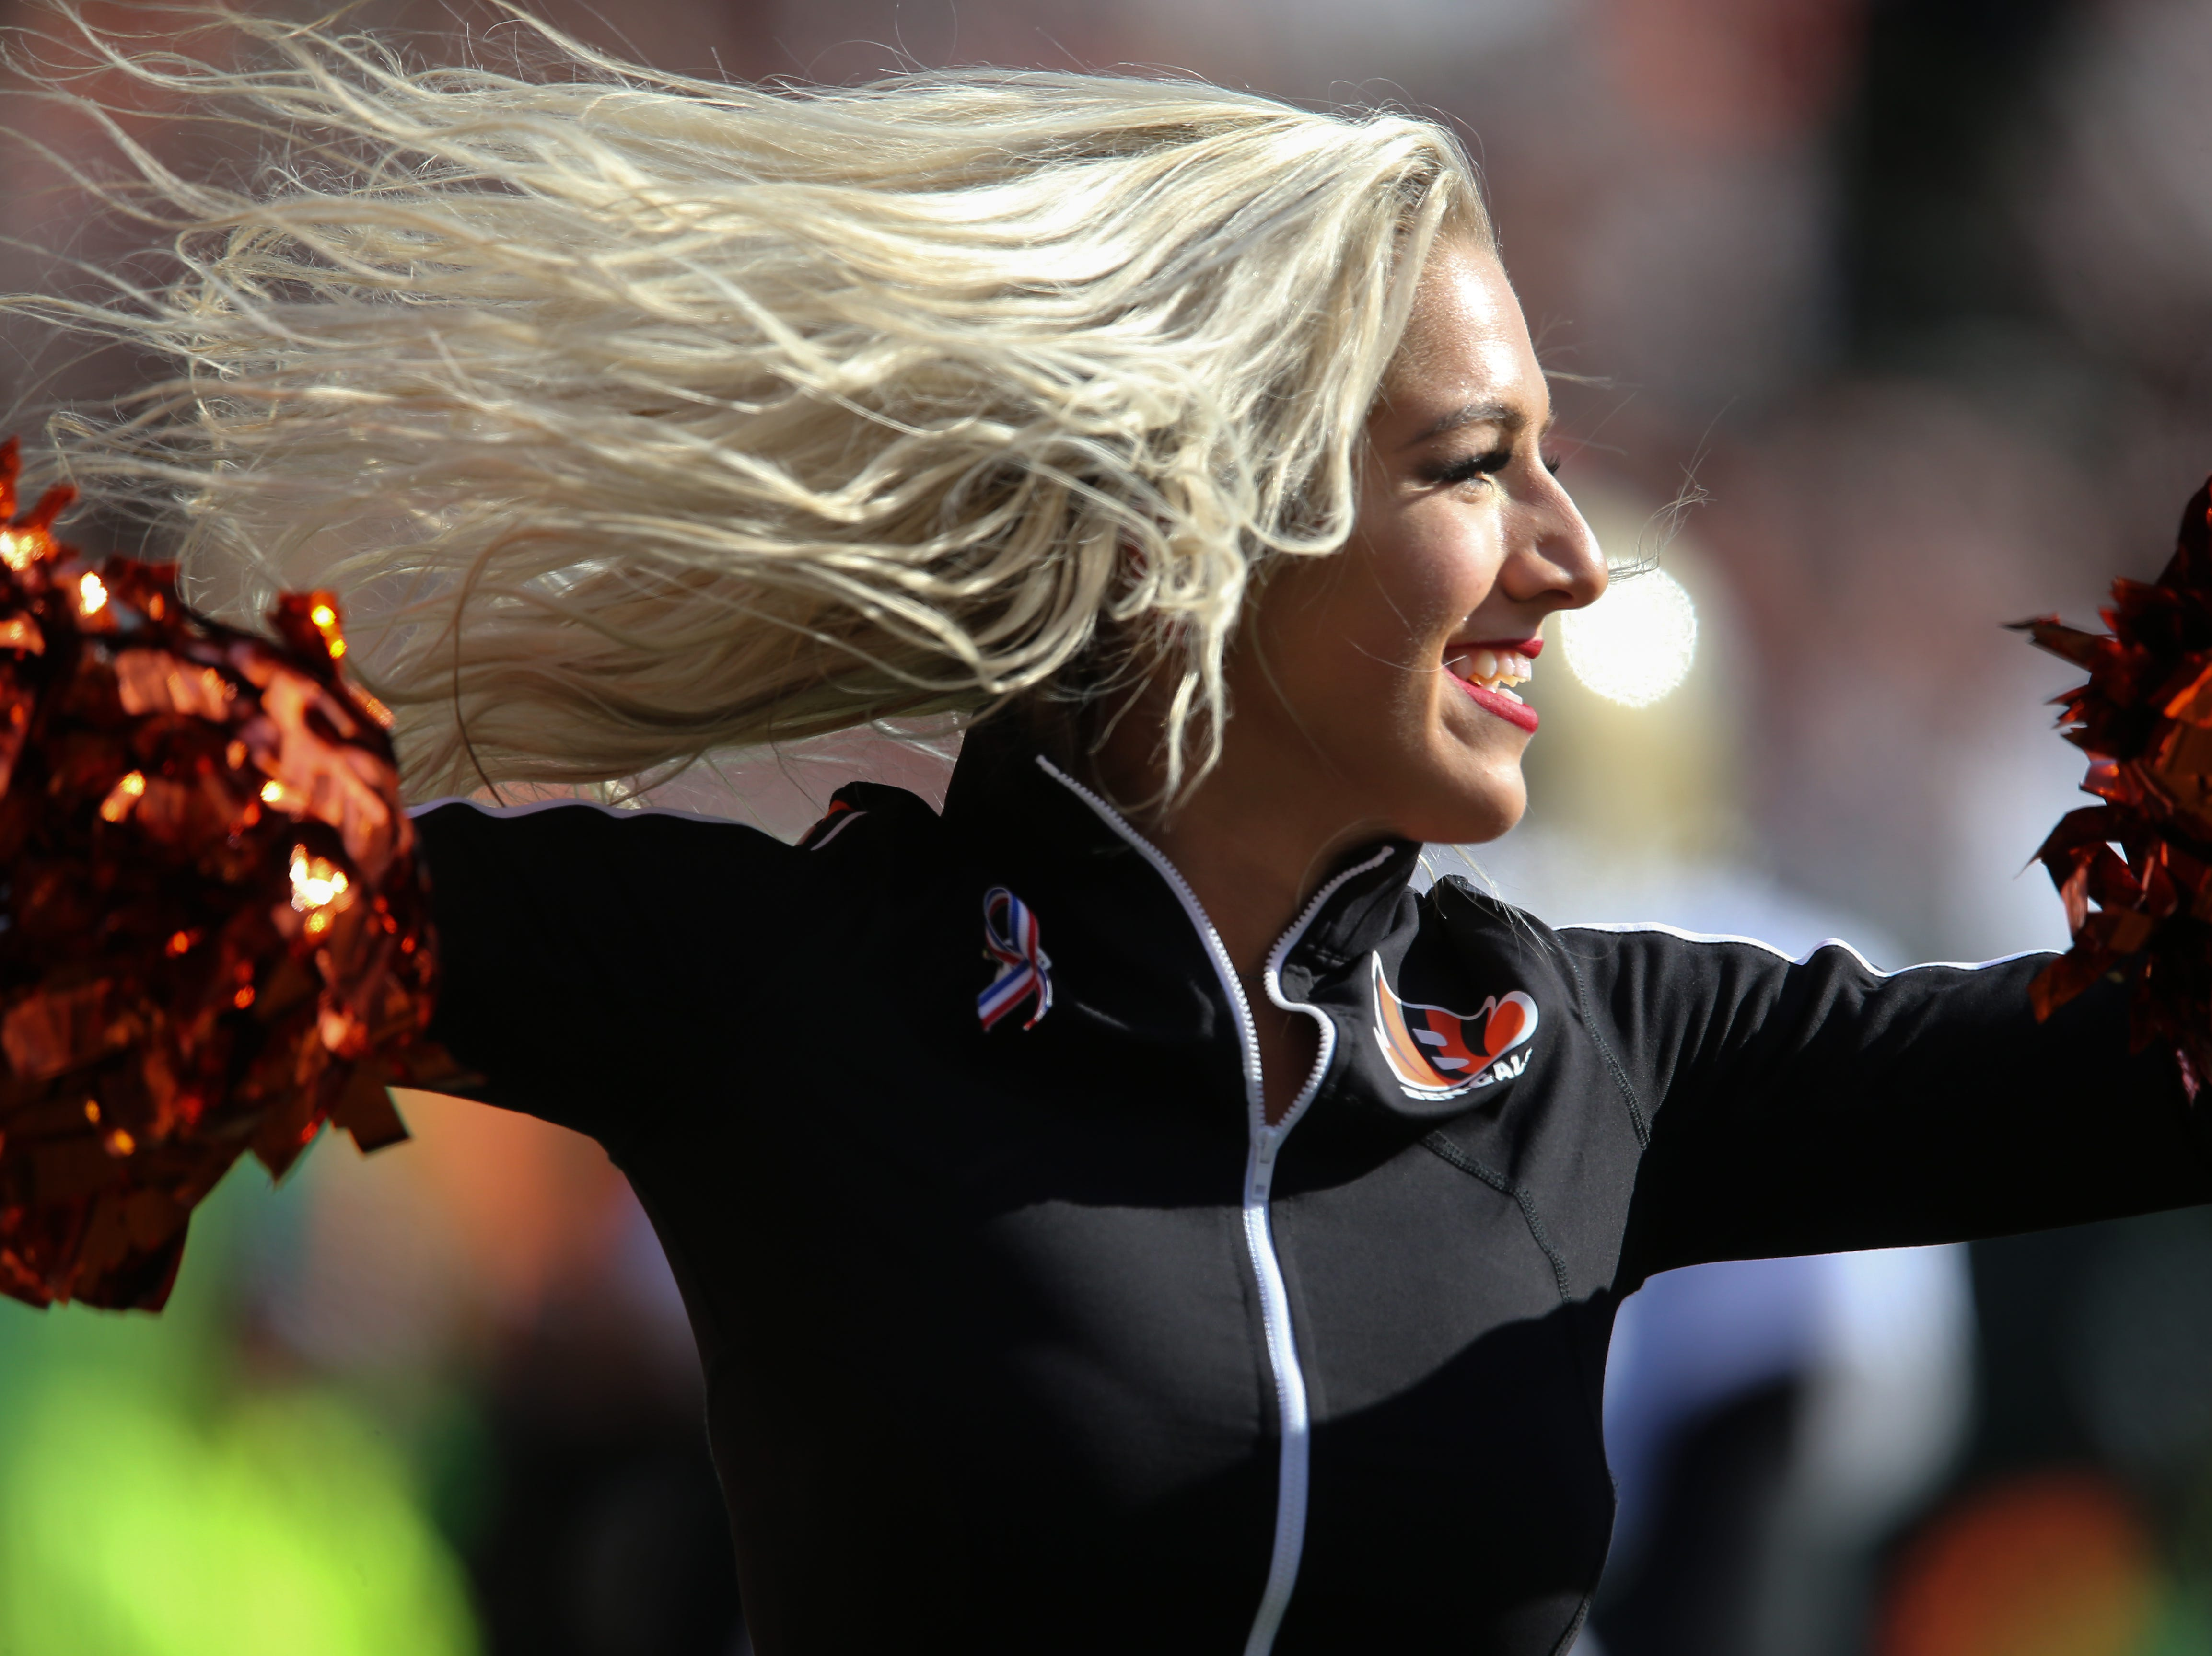 A Cincinnati Bengals Ben-Gal cheerleader performs in the first quarter of a Week 10 NFL game between the New Orleans Saints and the Cincinnati Bengals, Sunday, Nov. 11, 2018, at Paul Brown Stadium in Cincinnati.